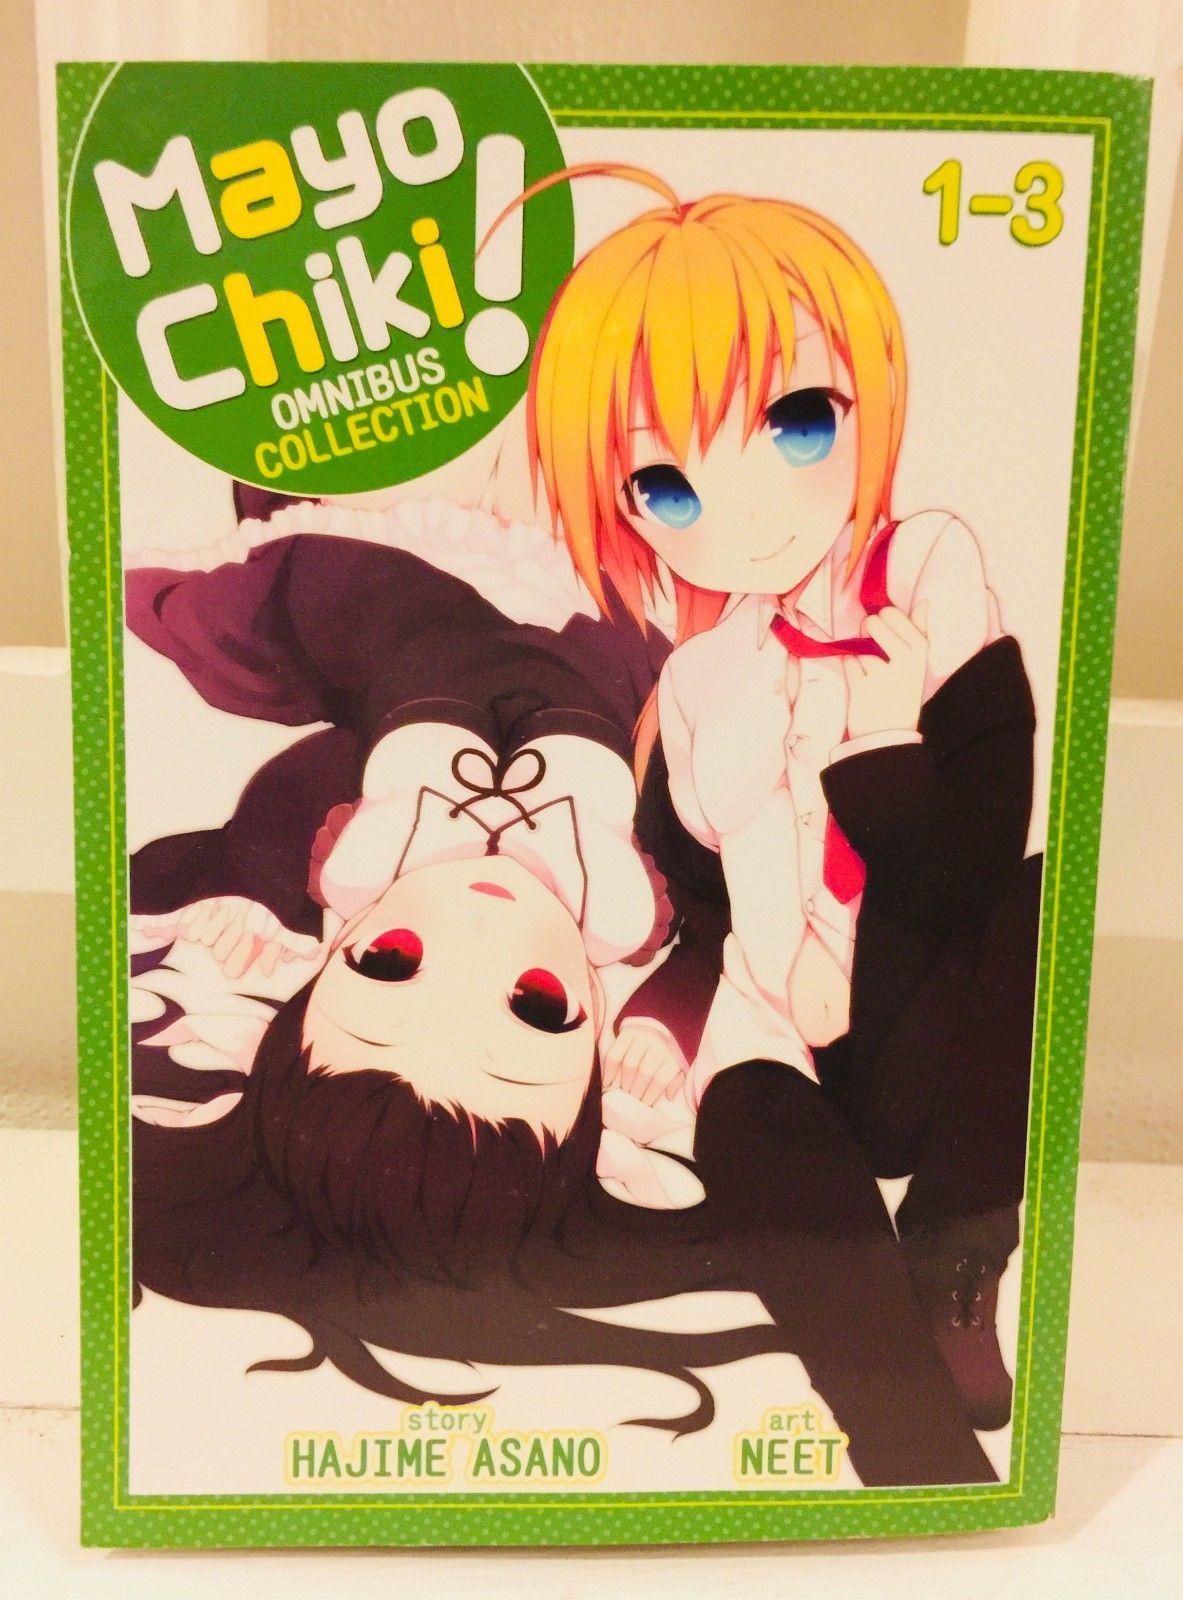 Manga: Mayo Chiki Omnibus Collection 1-3 - Trondheim  - Som ny!  Frakt: 50,-  Kan hentes i Trondheim!  Betaling: vipps, nettbank - Trondheim